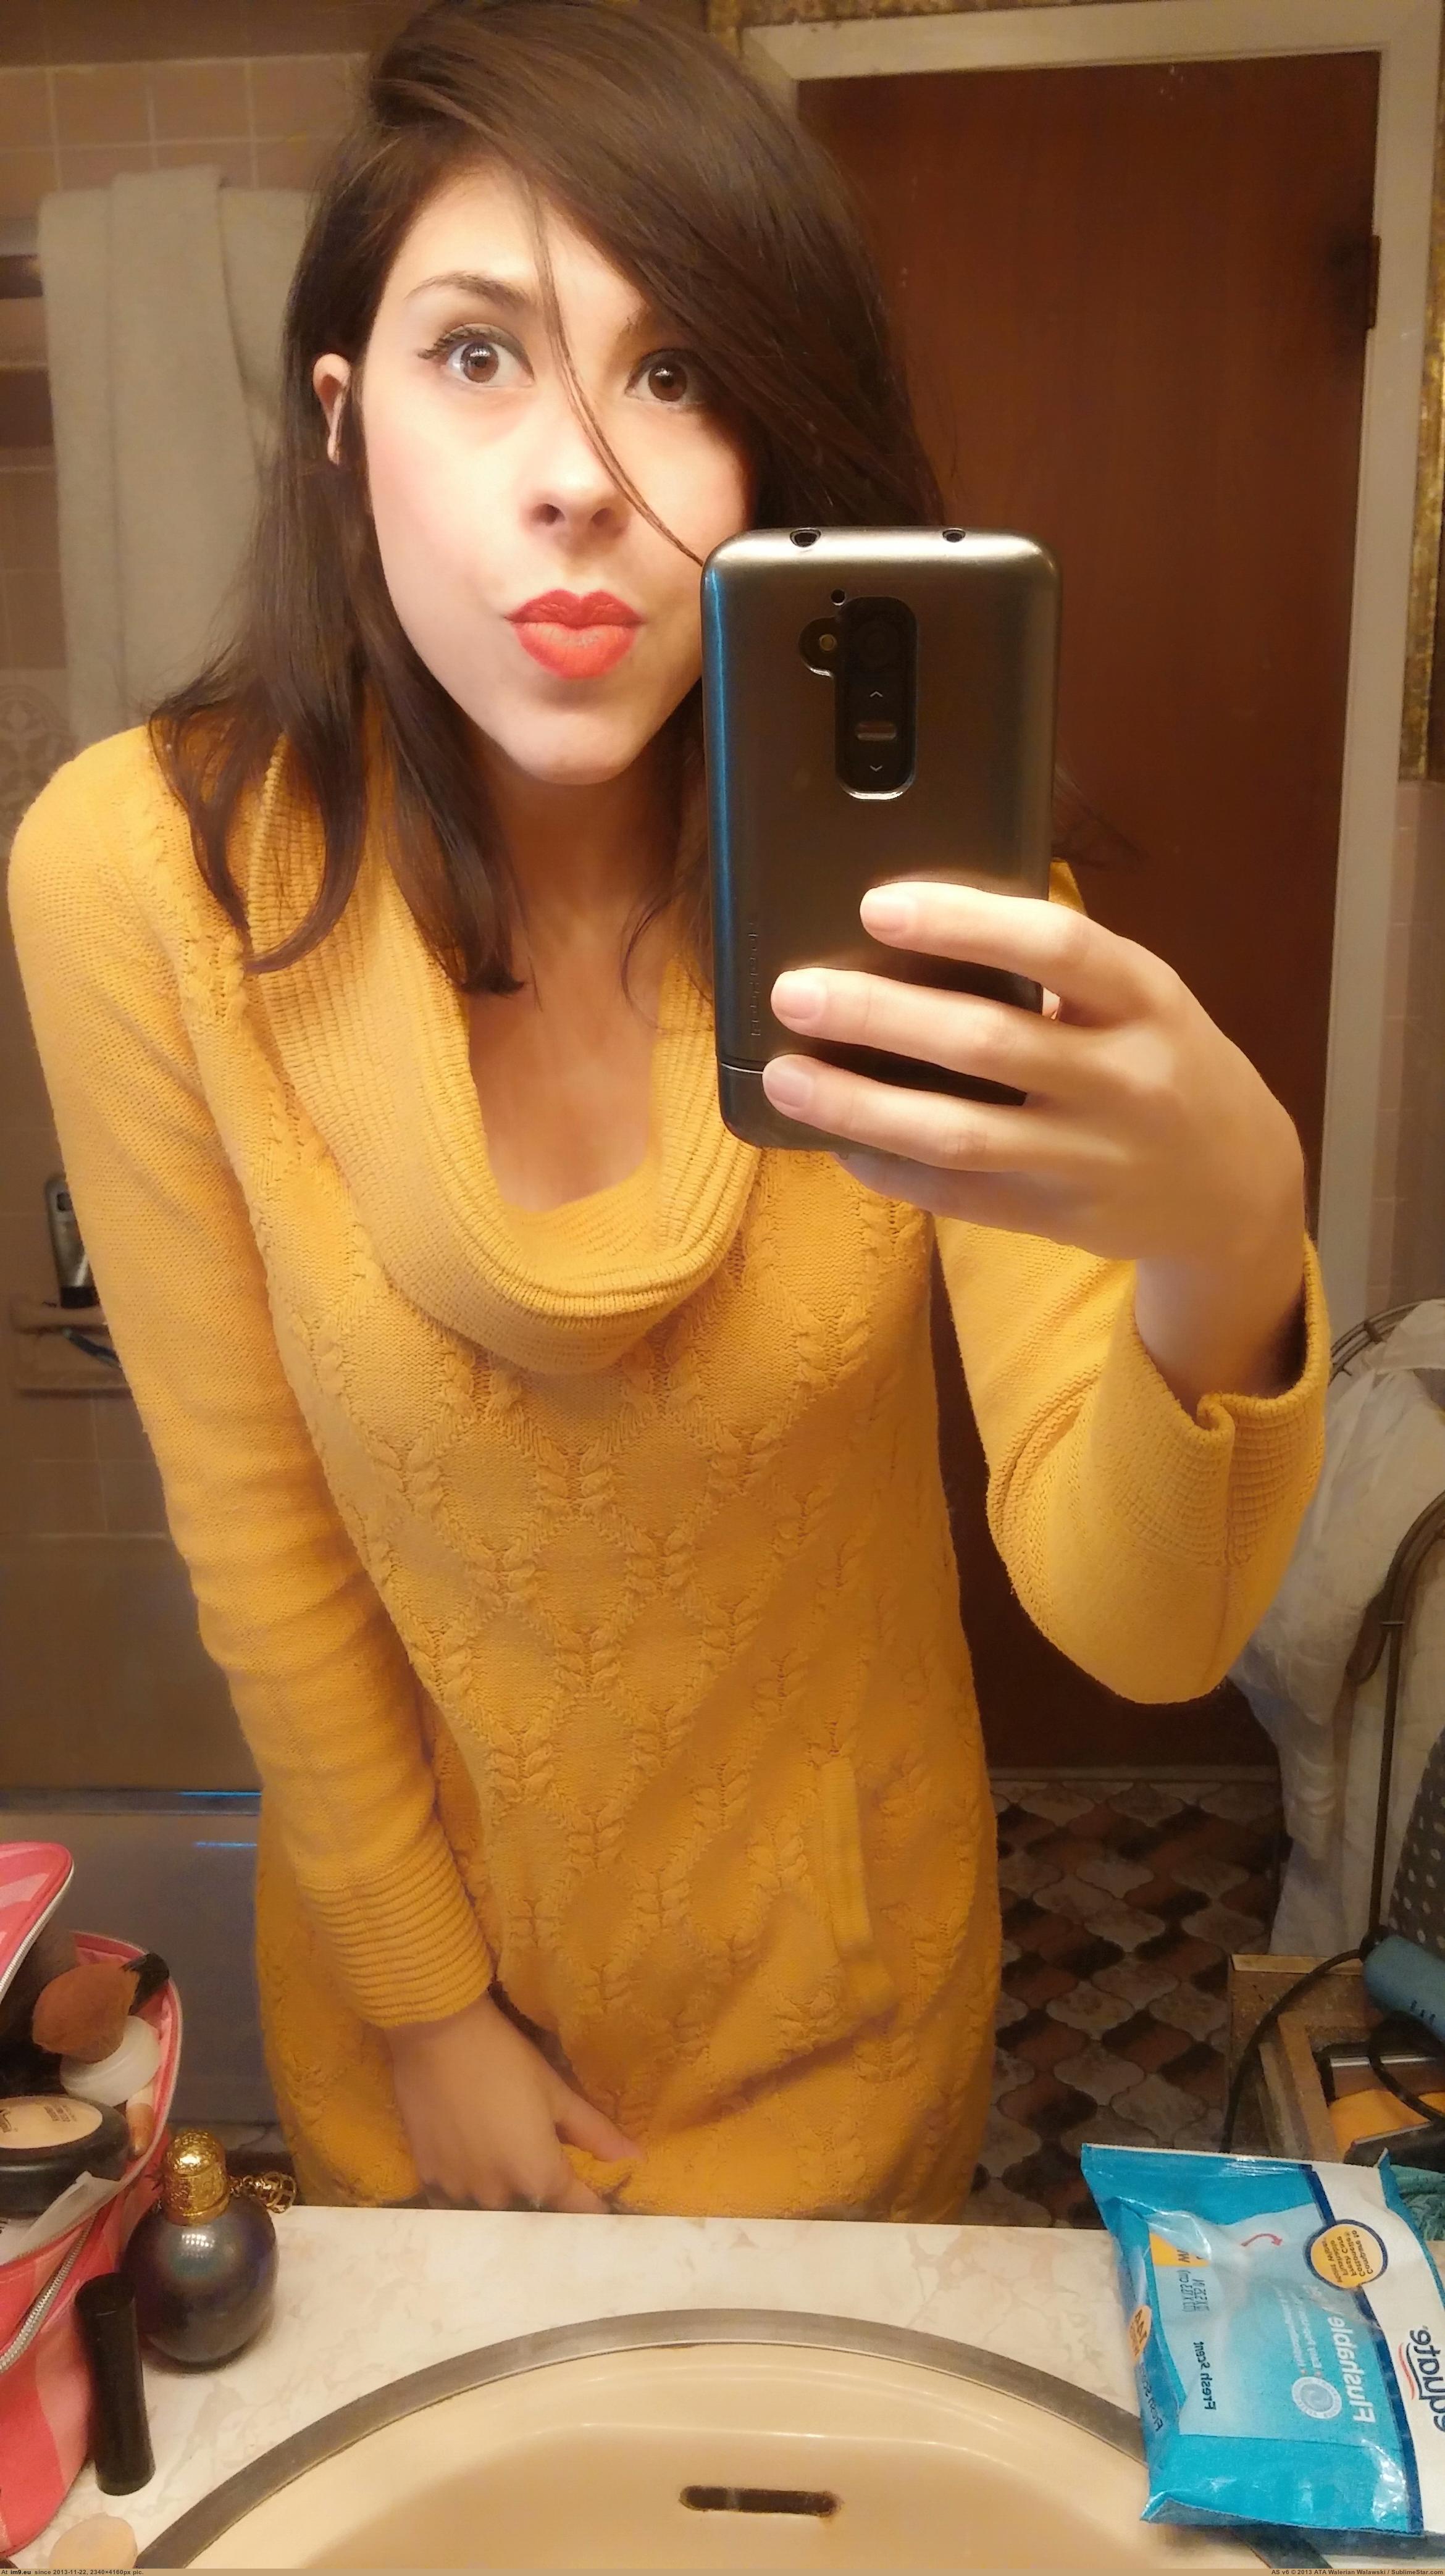 amateur-girl-boobs-selfshot-in-mirror-nude-01